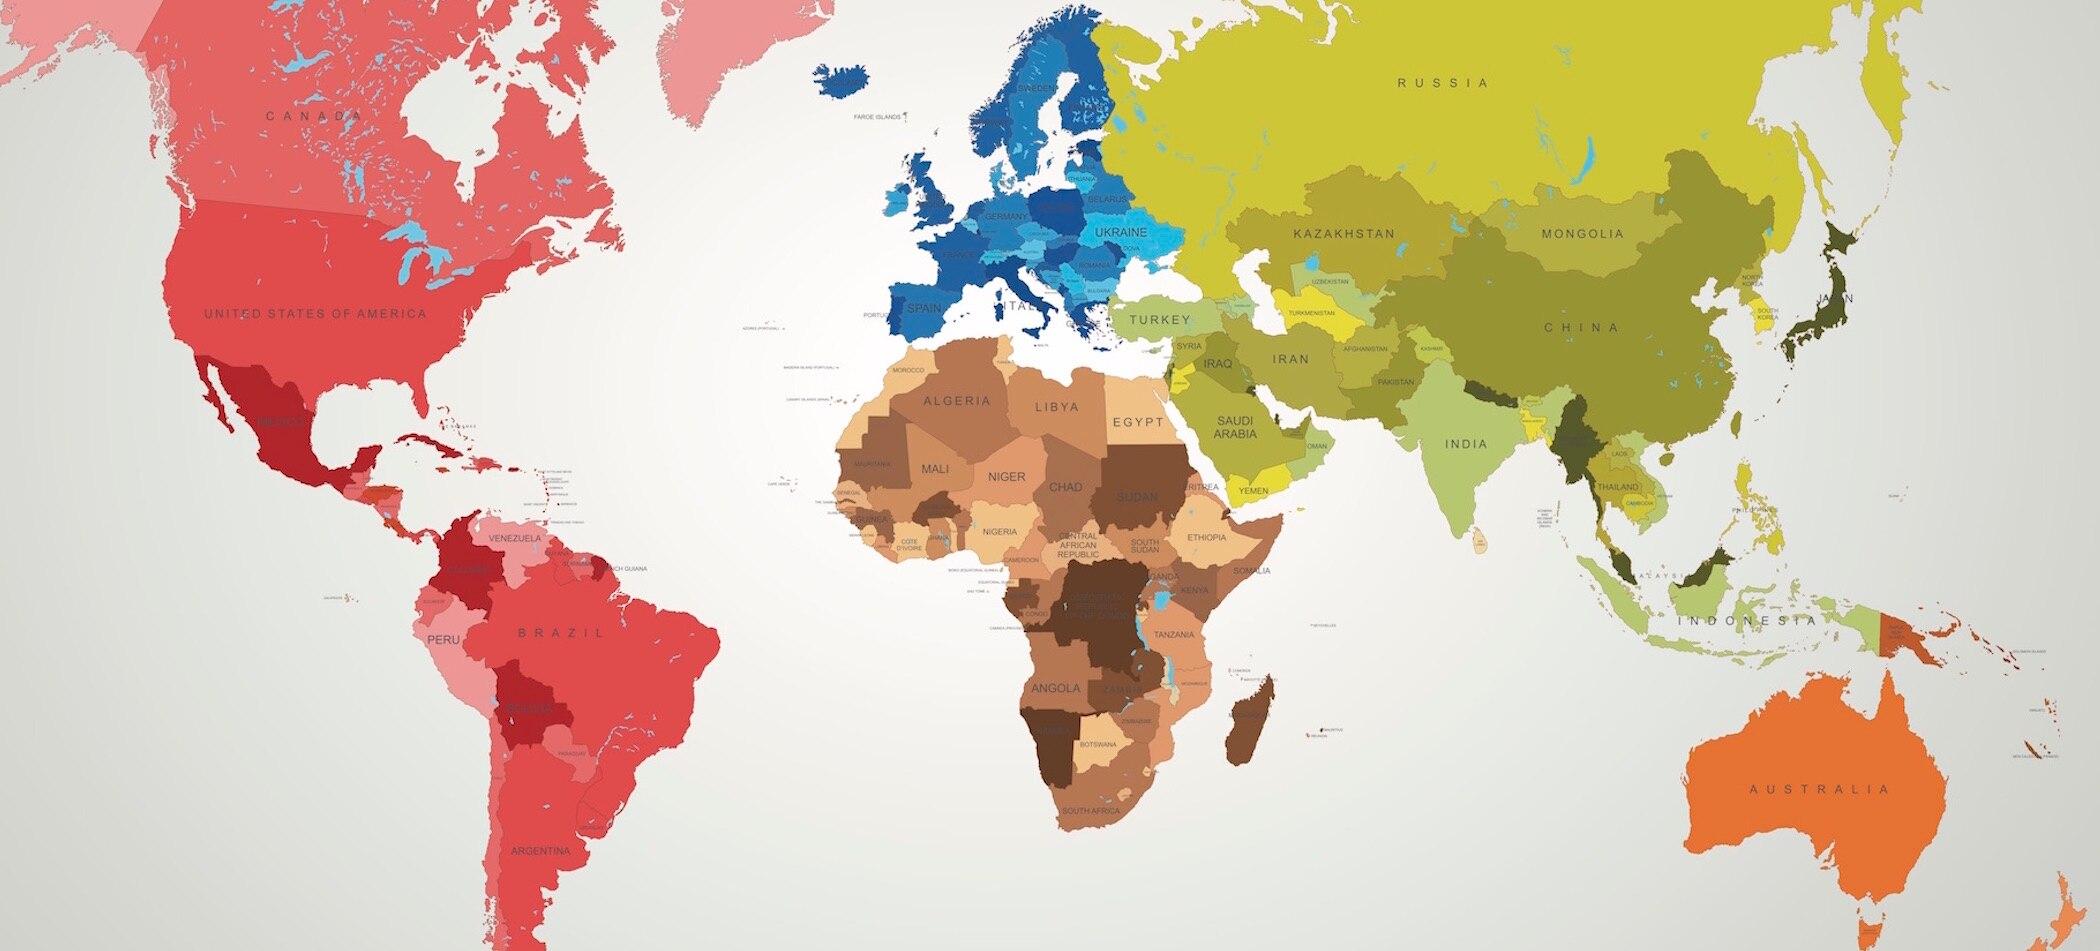 Weltkarte: Geografie-Quiz - Erdkunde-Wissen testen